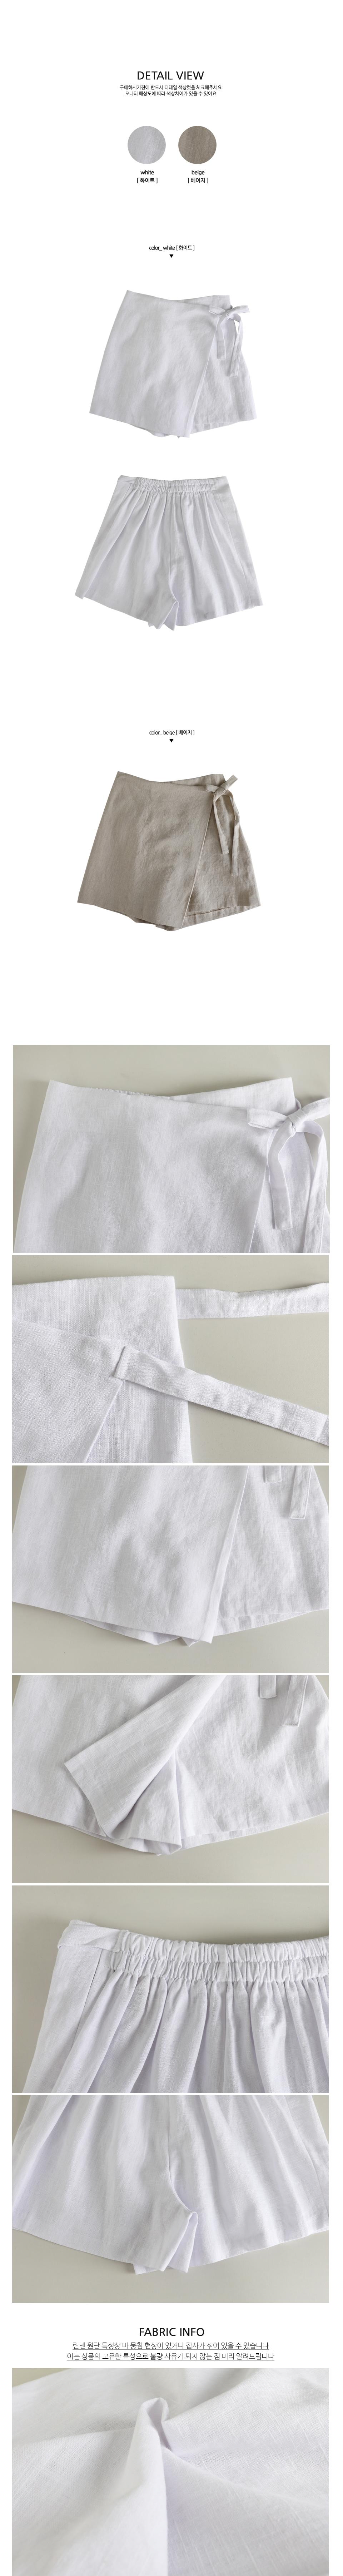 Ribbon linen skirt pants